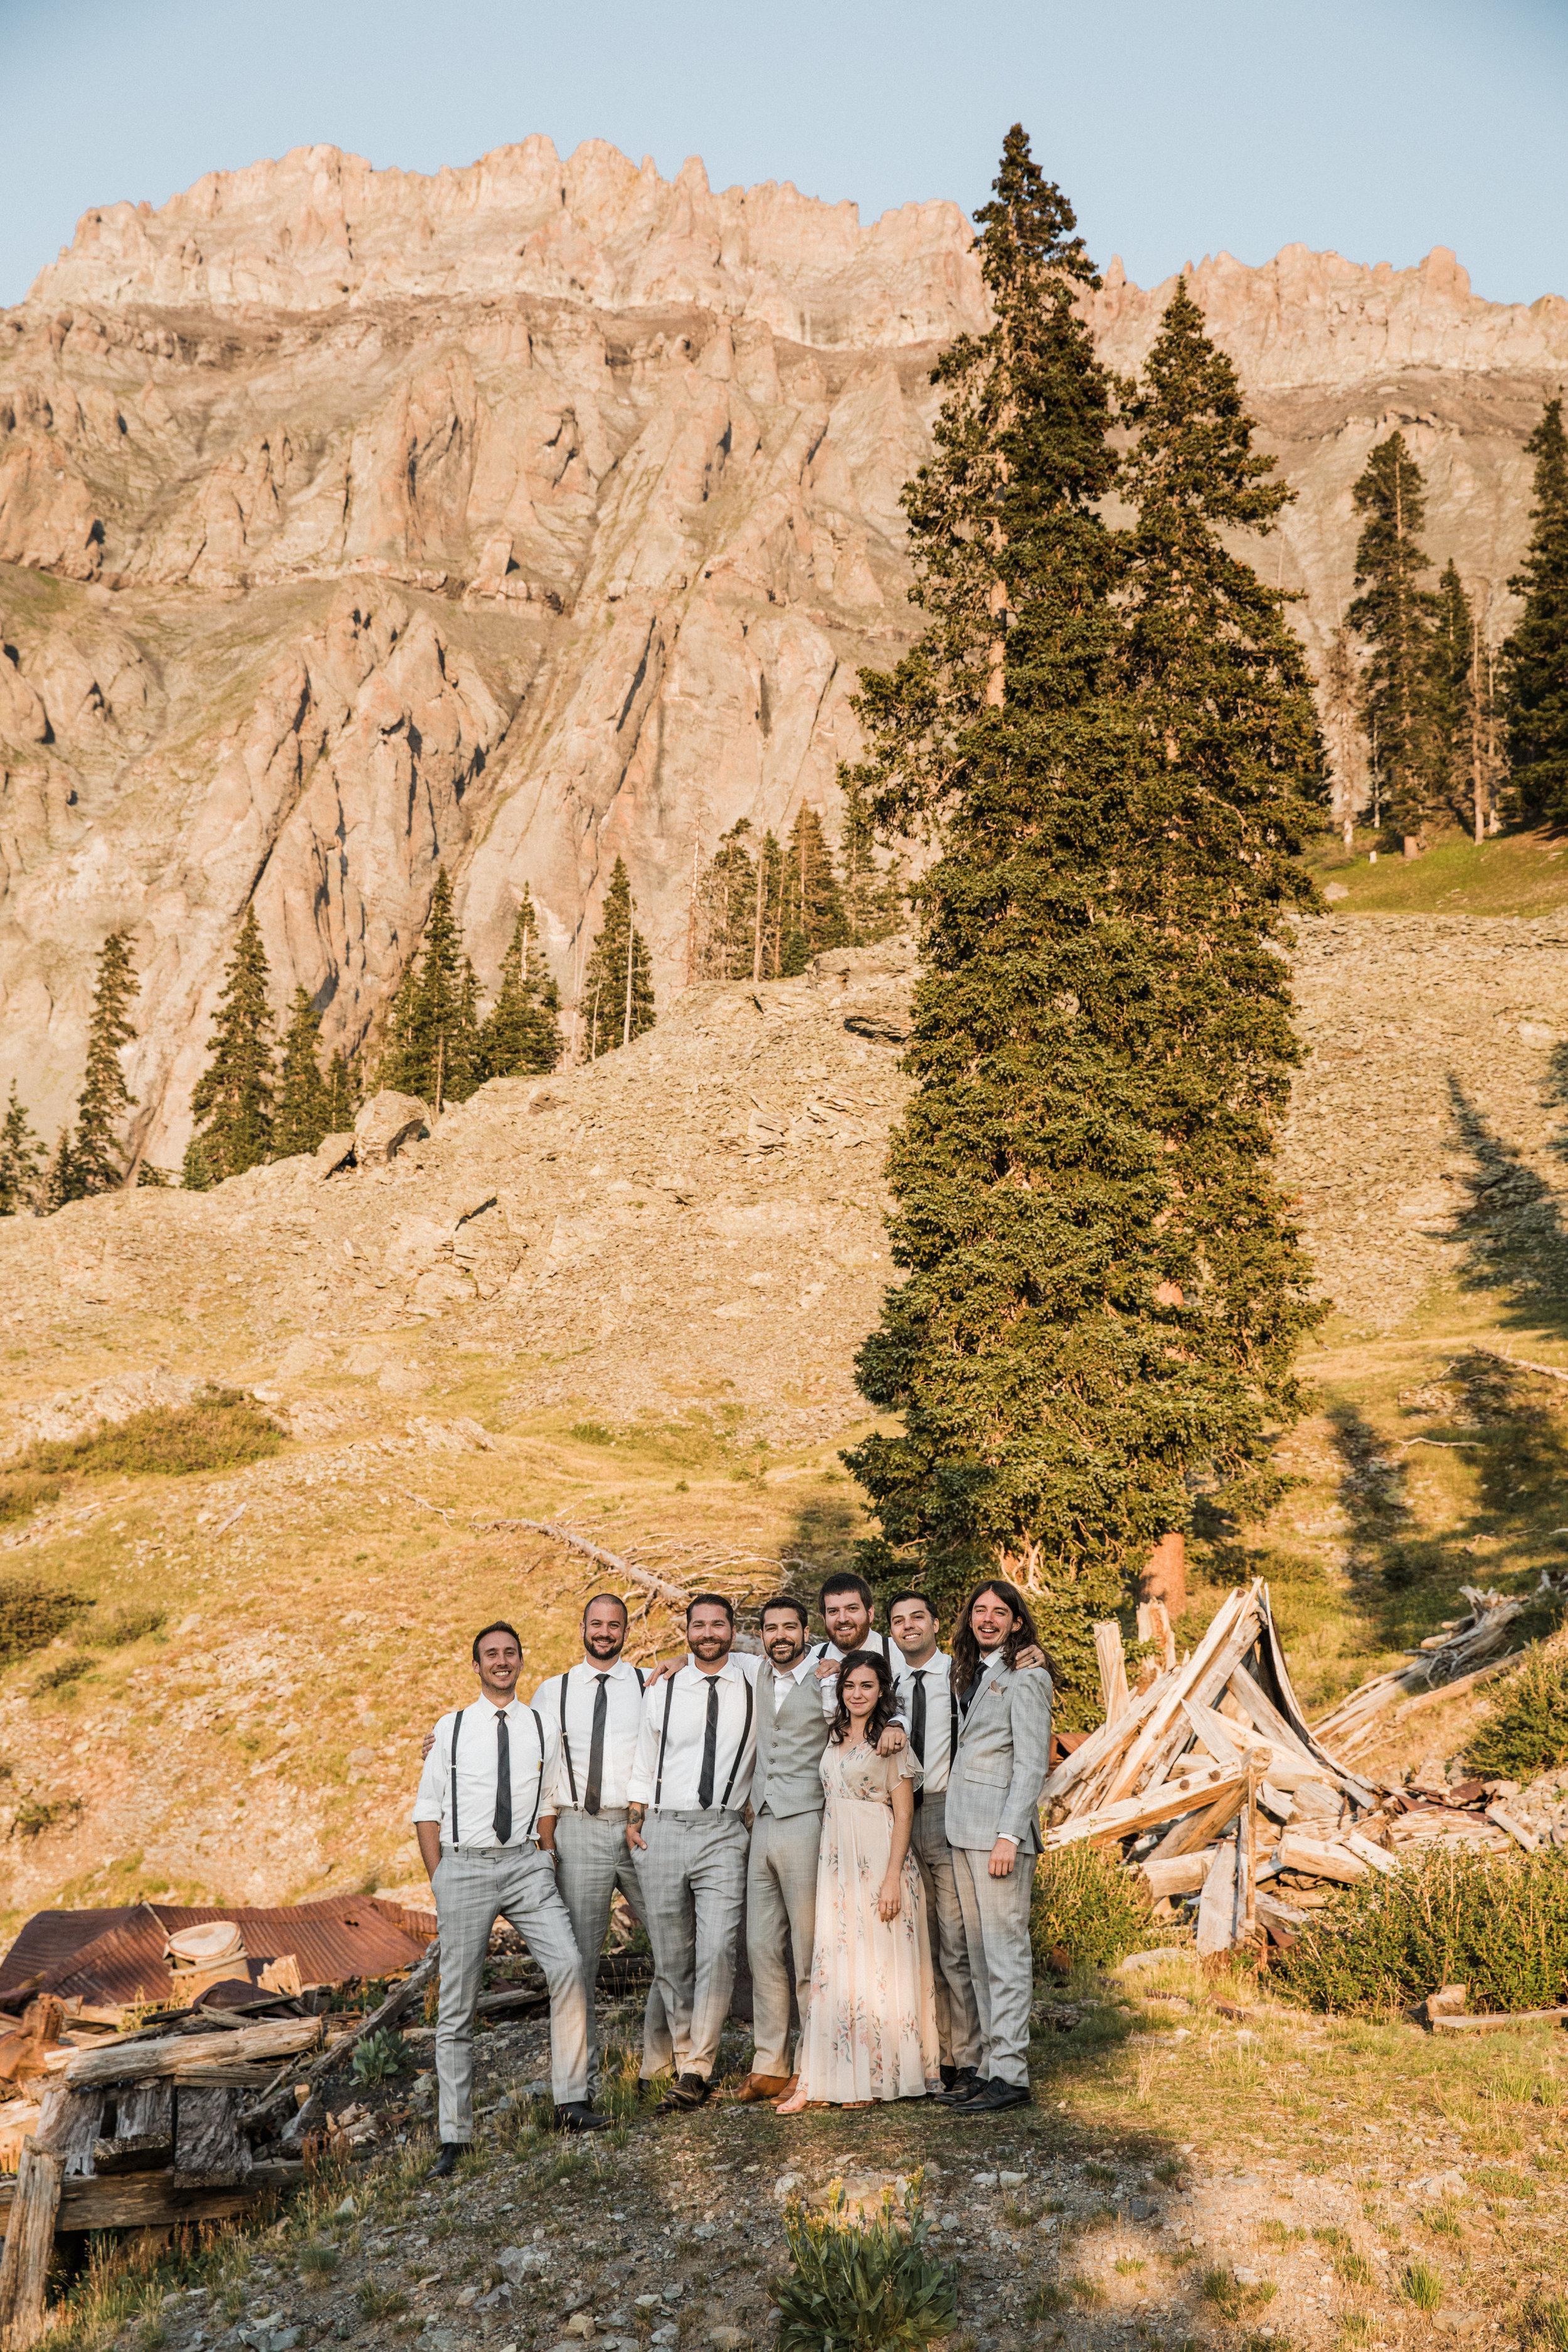 SB-leahandashton-telluride-wedding-photography-0038.jpg